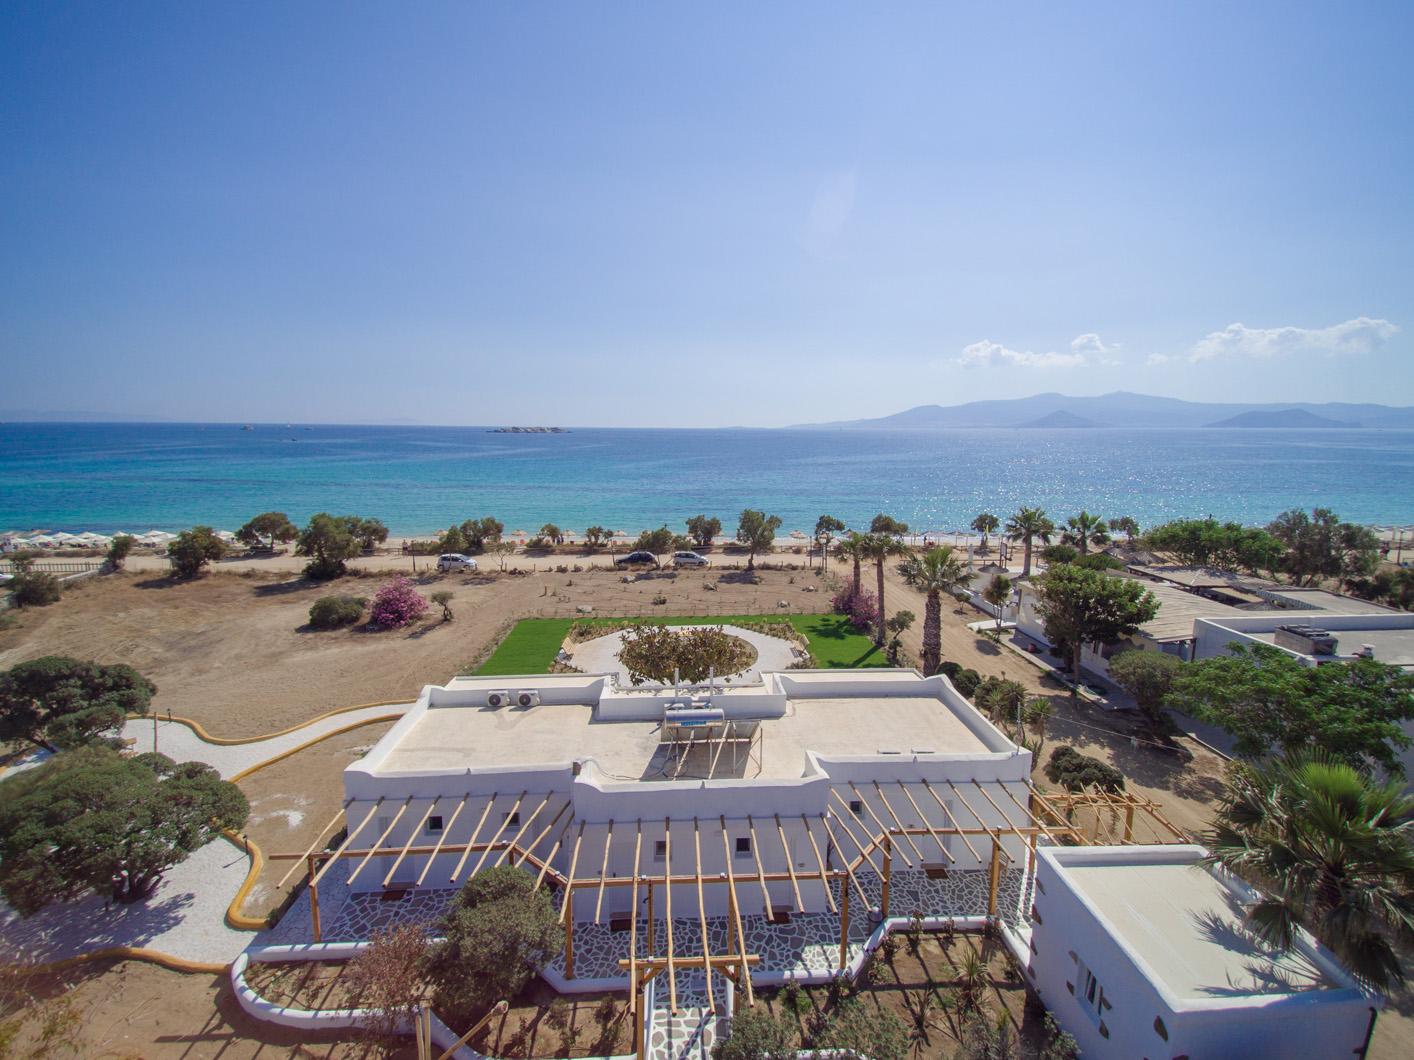 Glaronissi Beach Luxury Suites & Apartments